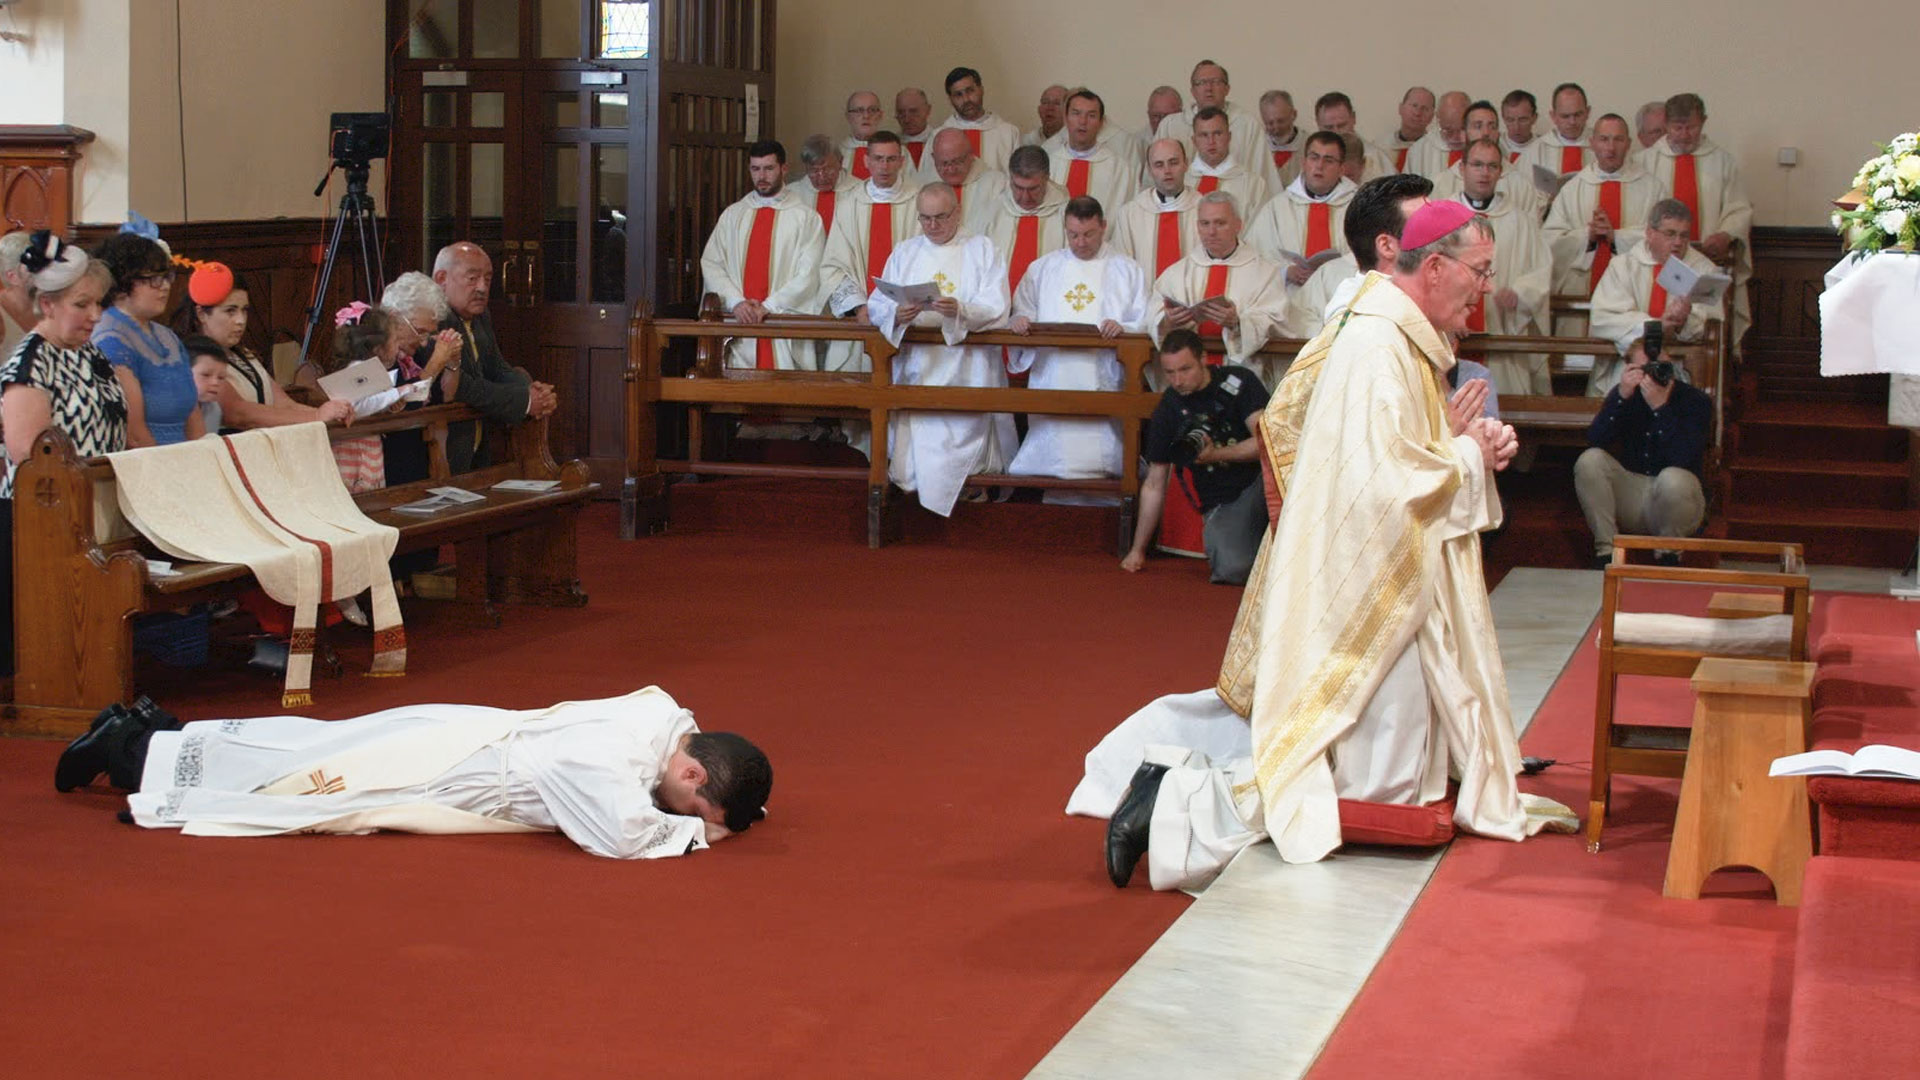 Memories of my ordination – Fr David Vard